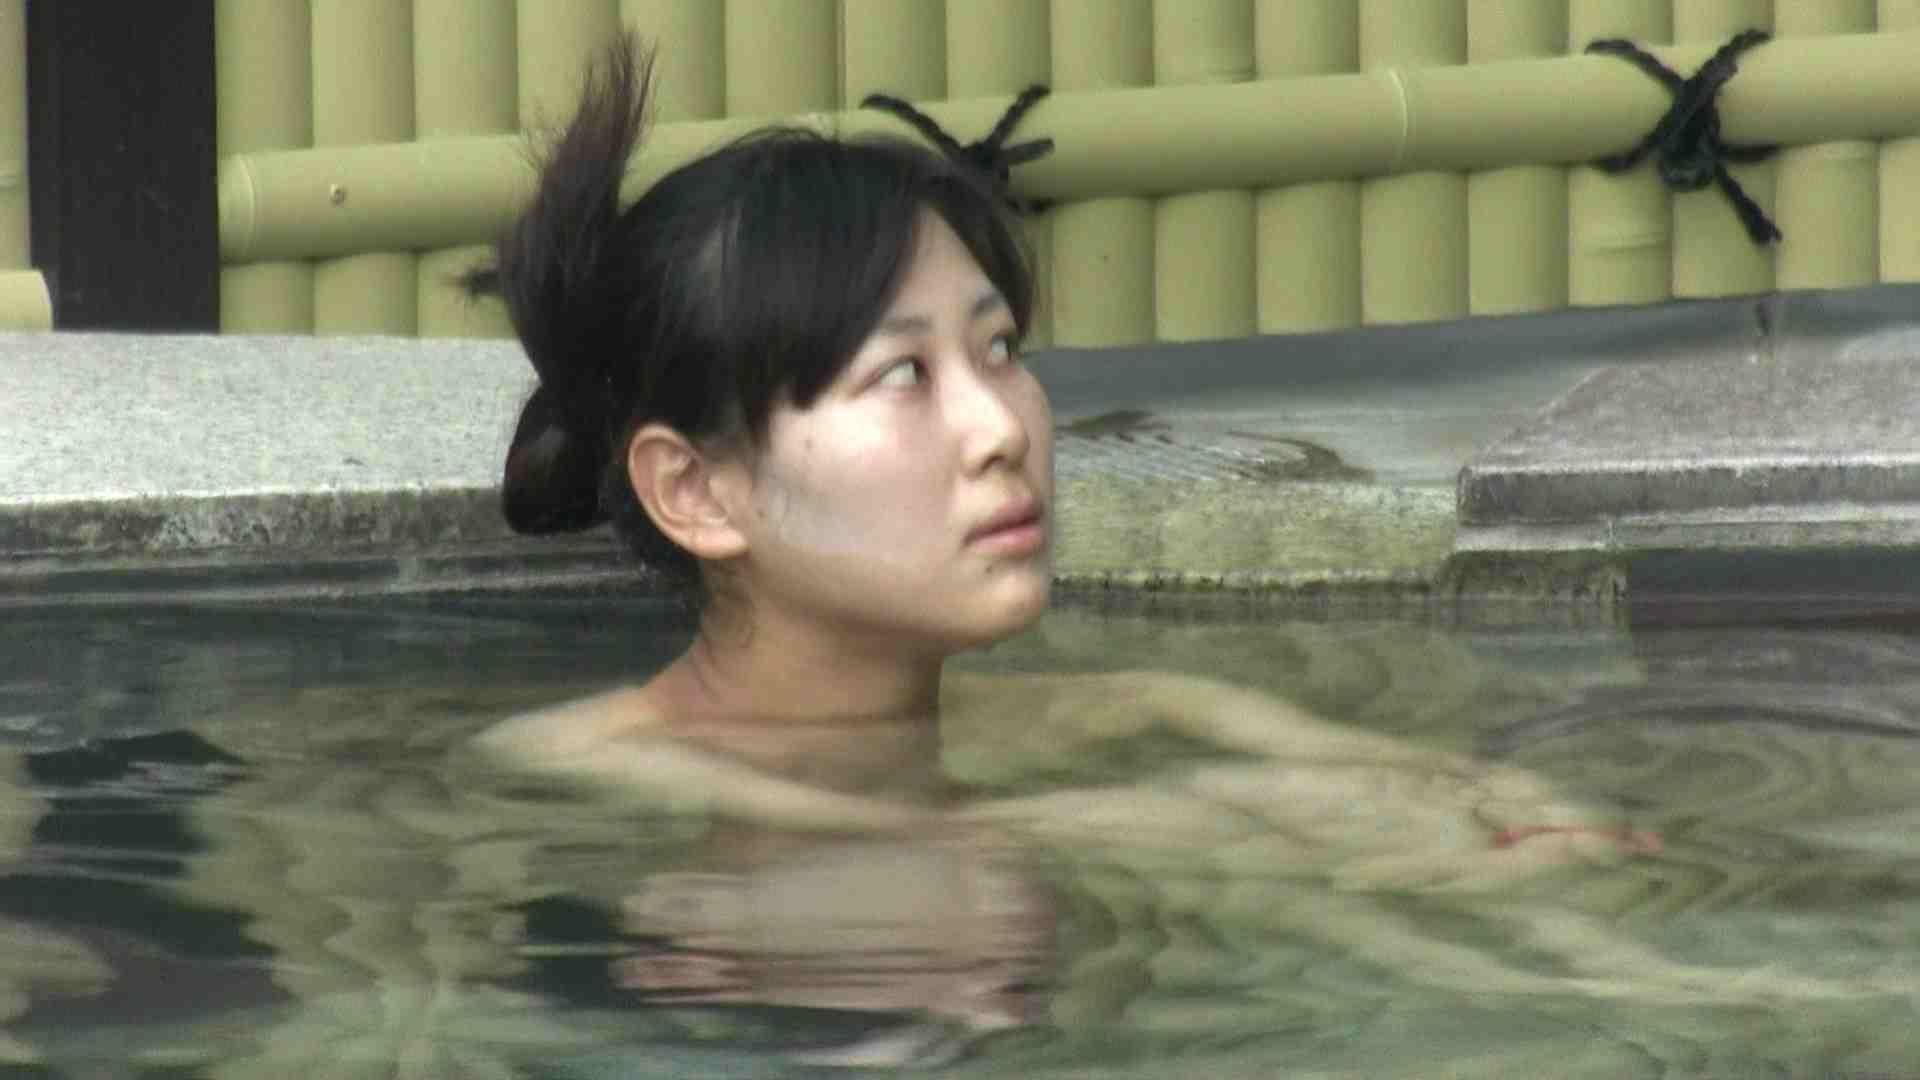 Aquaな露天風呂Vol.665 HなOL   盗撮  104pic 39